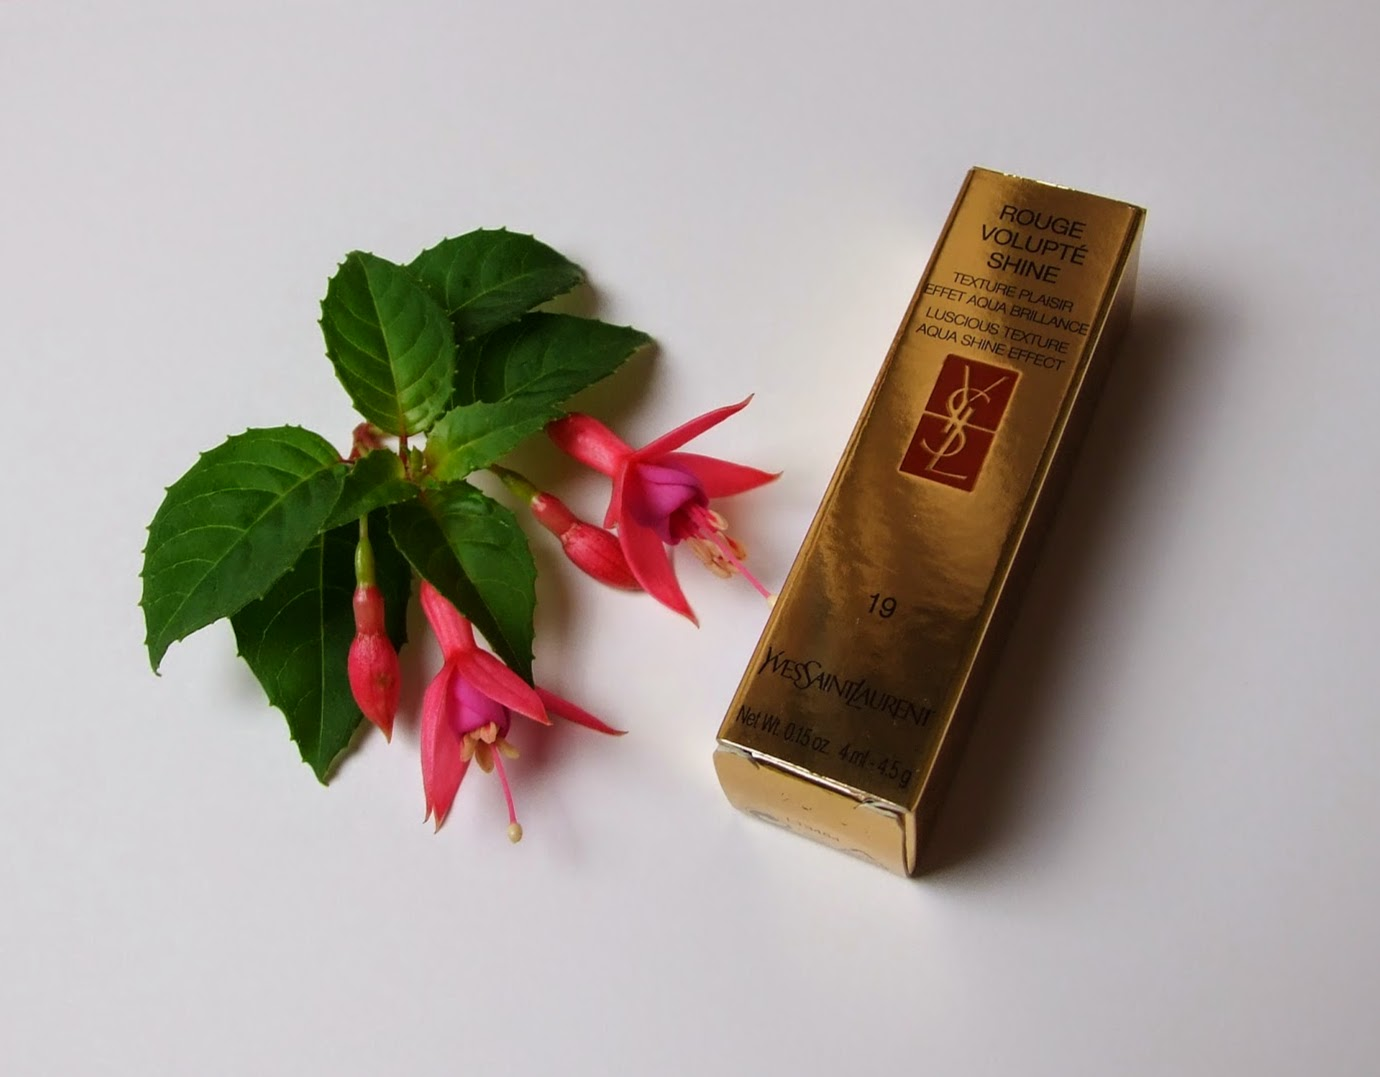 YSL Rouge volupte shine lipstick Fuchsia in rage No 19 beauty blog review swatch lips